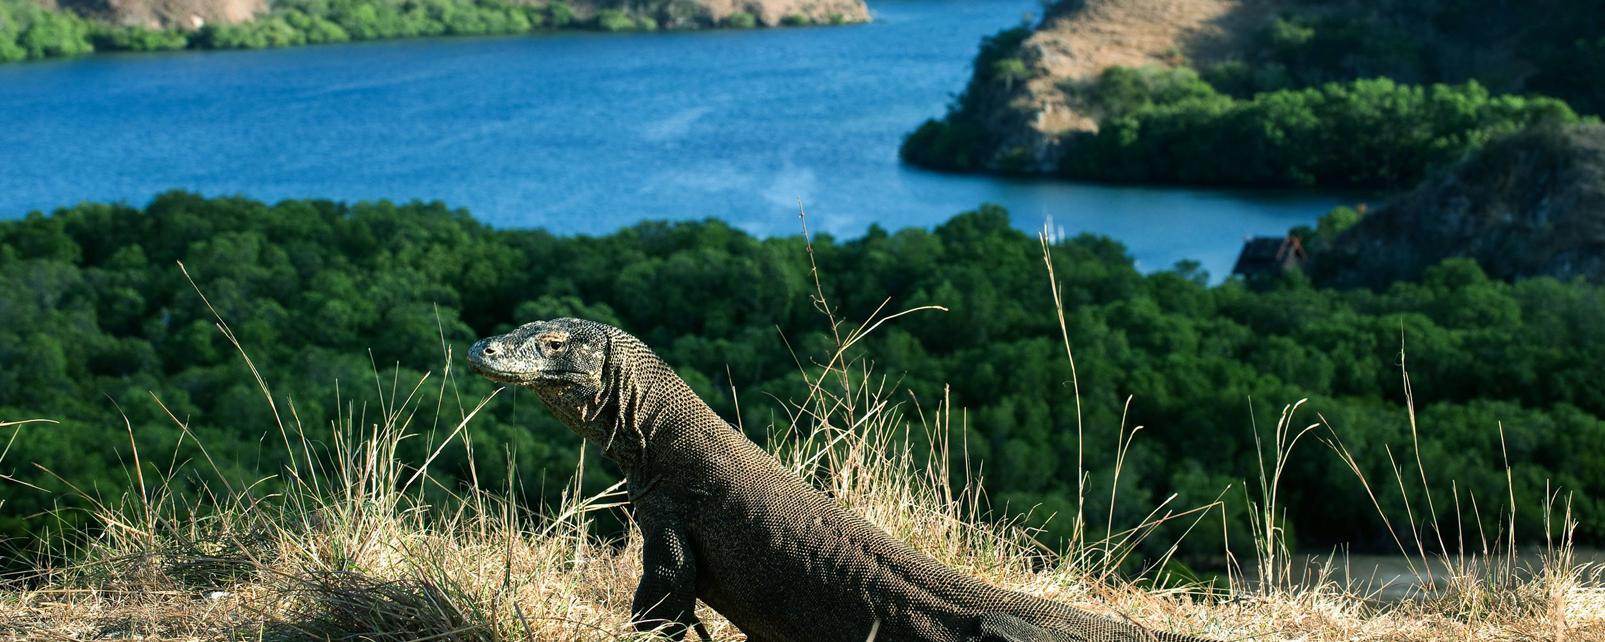 Asie, Indonésie, Le Timor, Rinca, île, dragon Komodo,